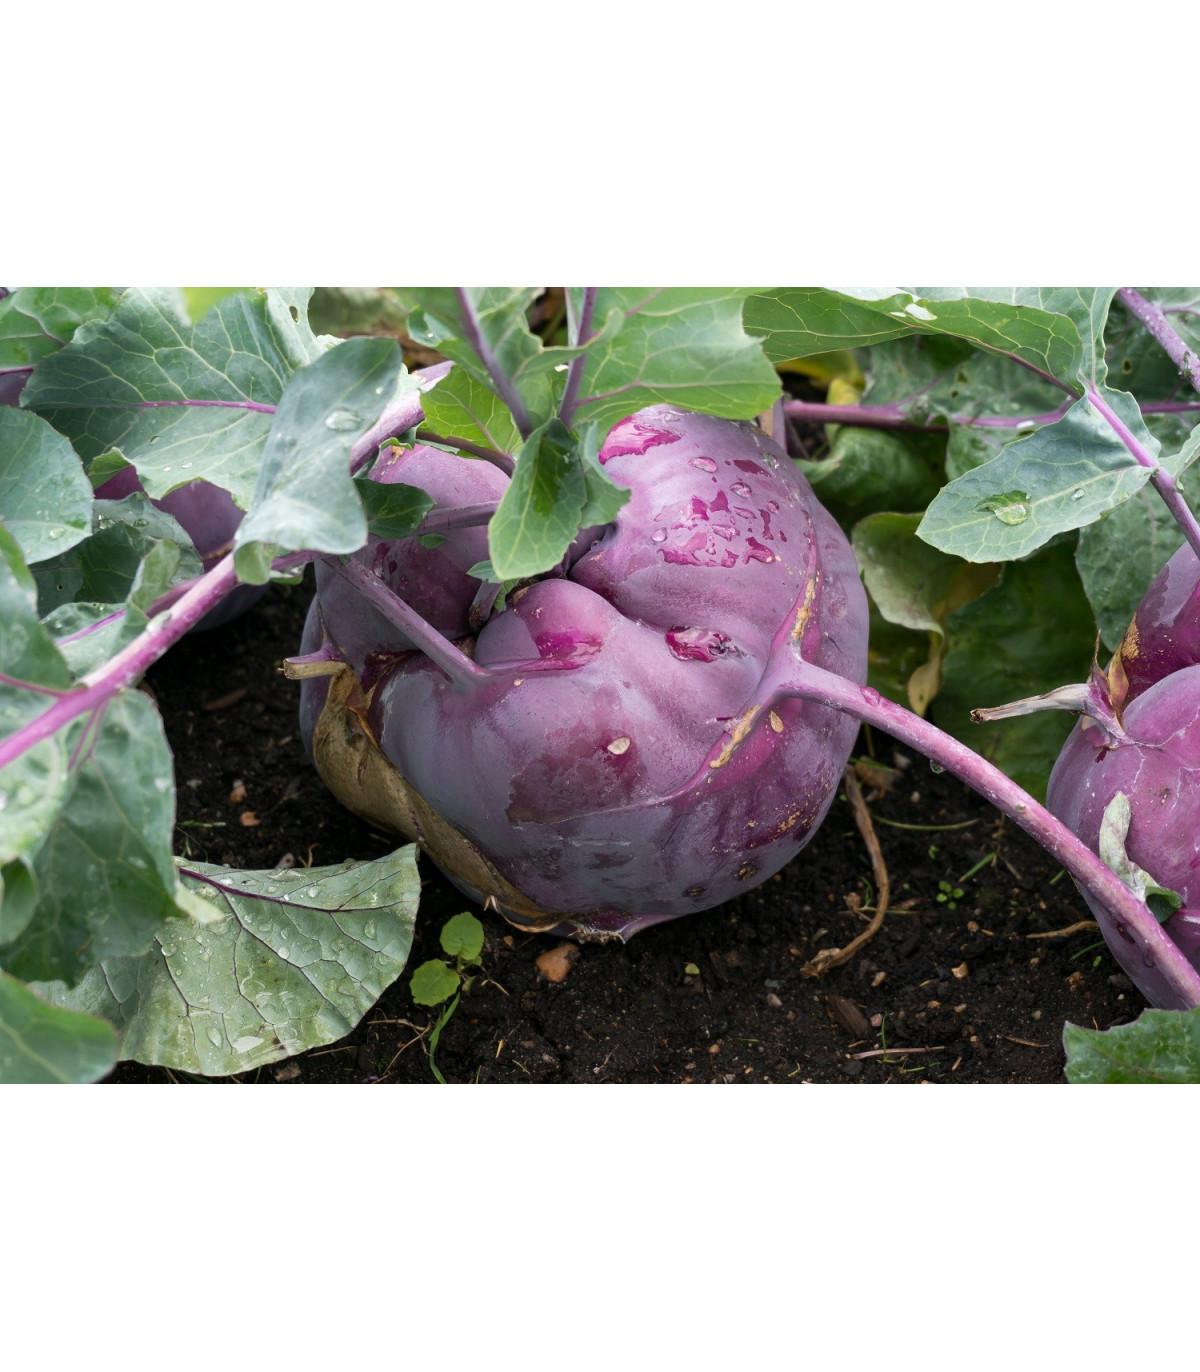 Kaleráb skorý modrý - Brassica oleracea - semiačka - 50 ks